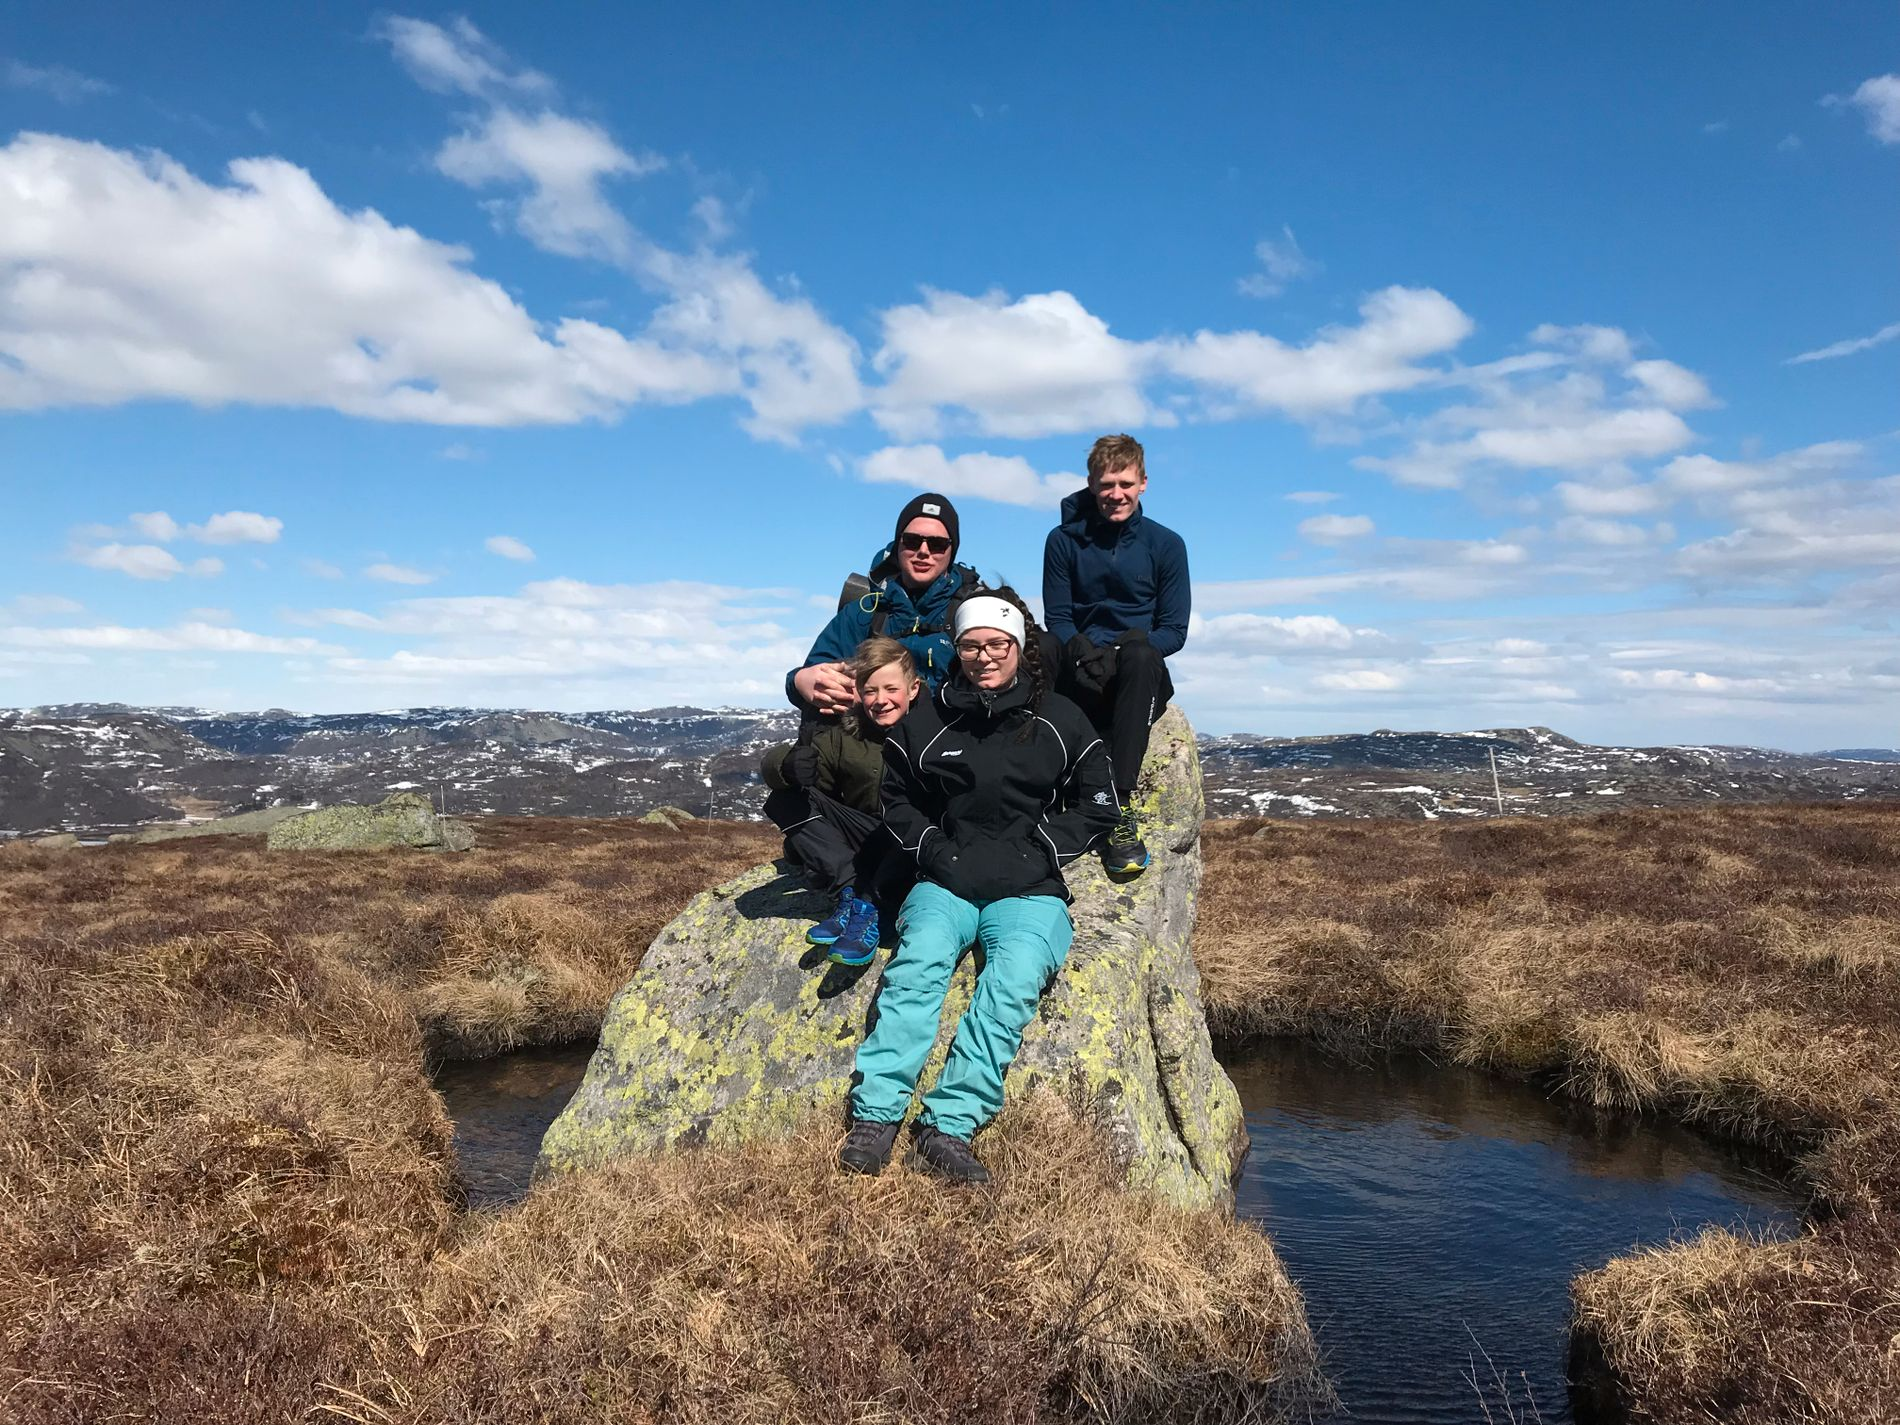 PÅSKEVÆRET: May Klungeland (43) har tatt med familien på fjelltur.